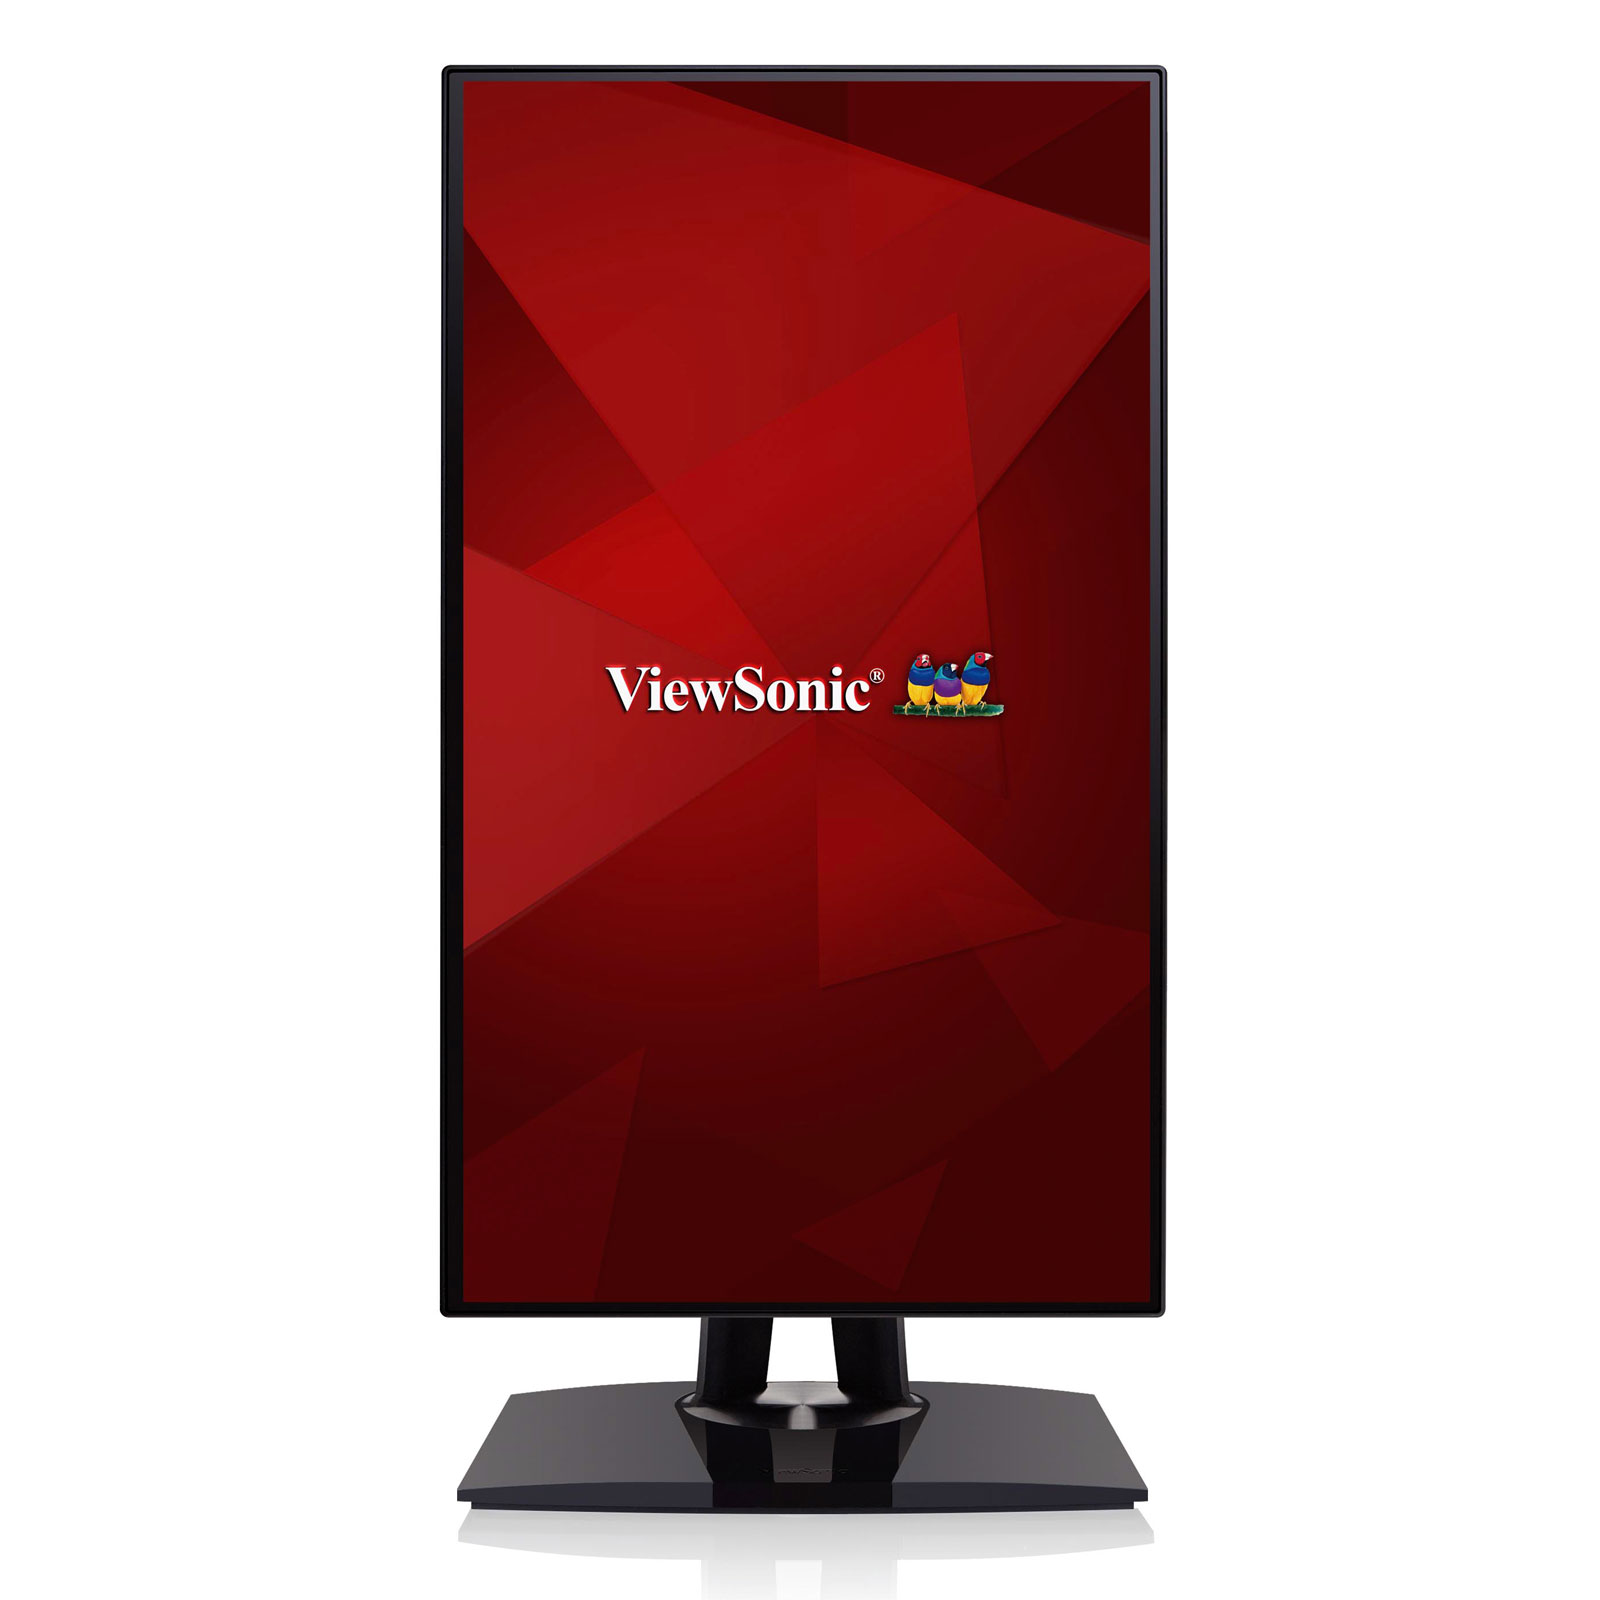 viewsonic 32 led vp3268 4k ecran pc viewsonic sur. Black Bedroom Furniture Sets. Home Design Ideas